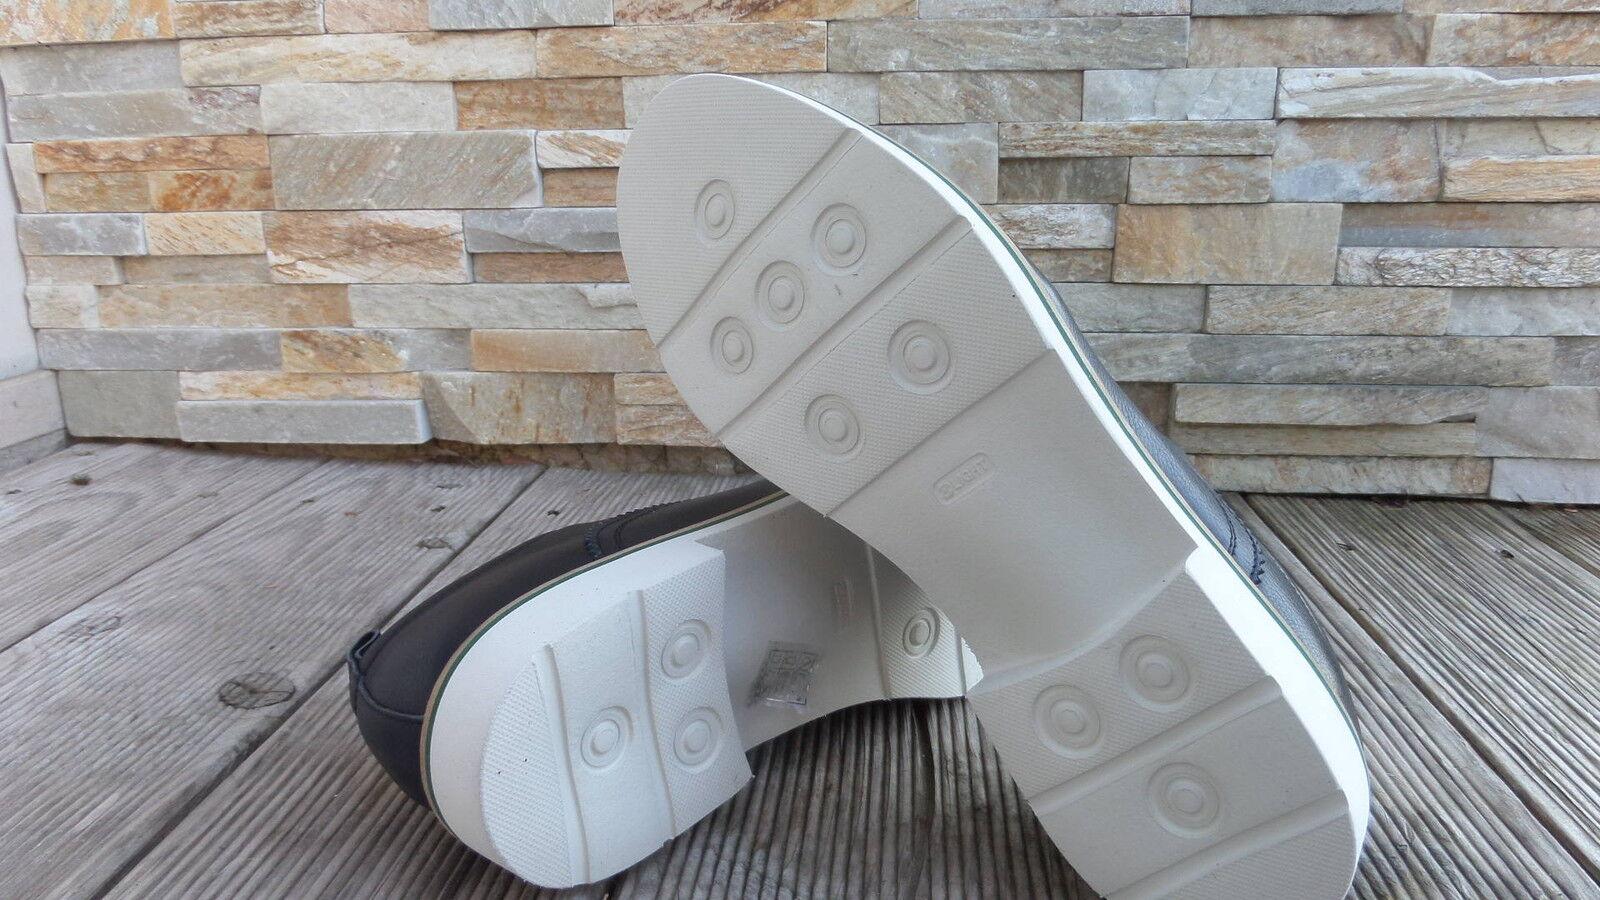 GALLIANO Gr 43 Halbschuhe Slipper UVP Schuhe schuhe Nieten schwarz UVP Slipper 395 745e85